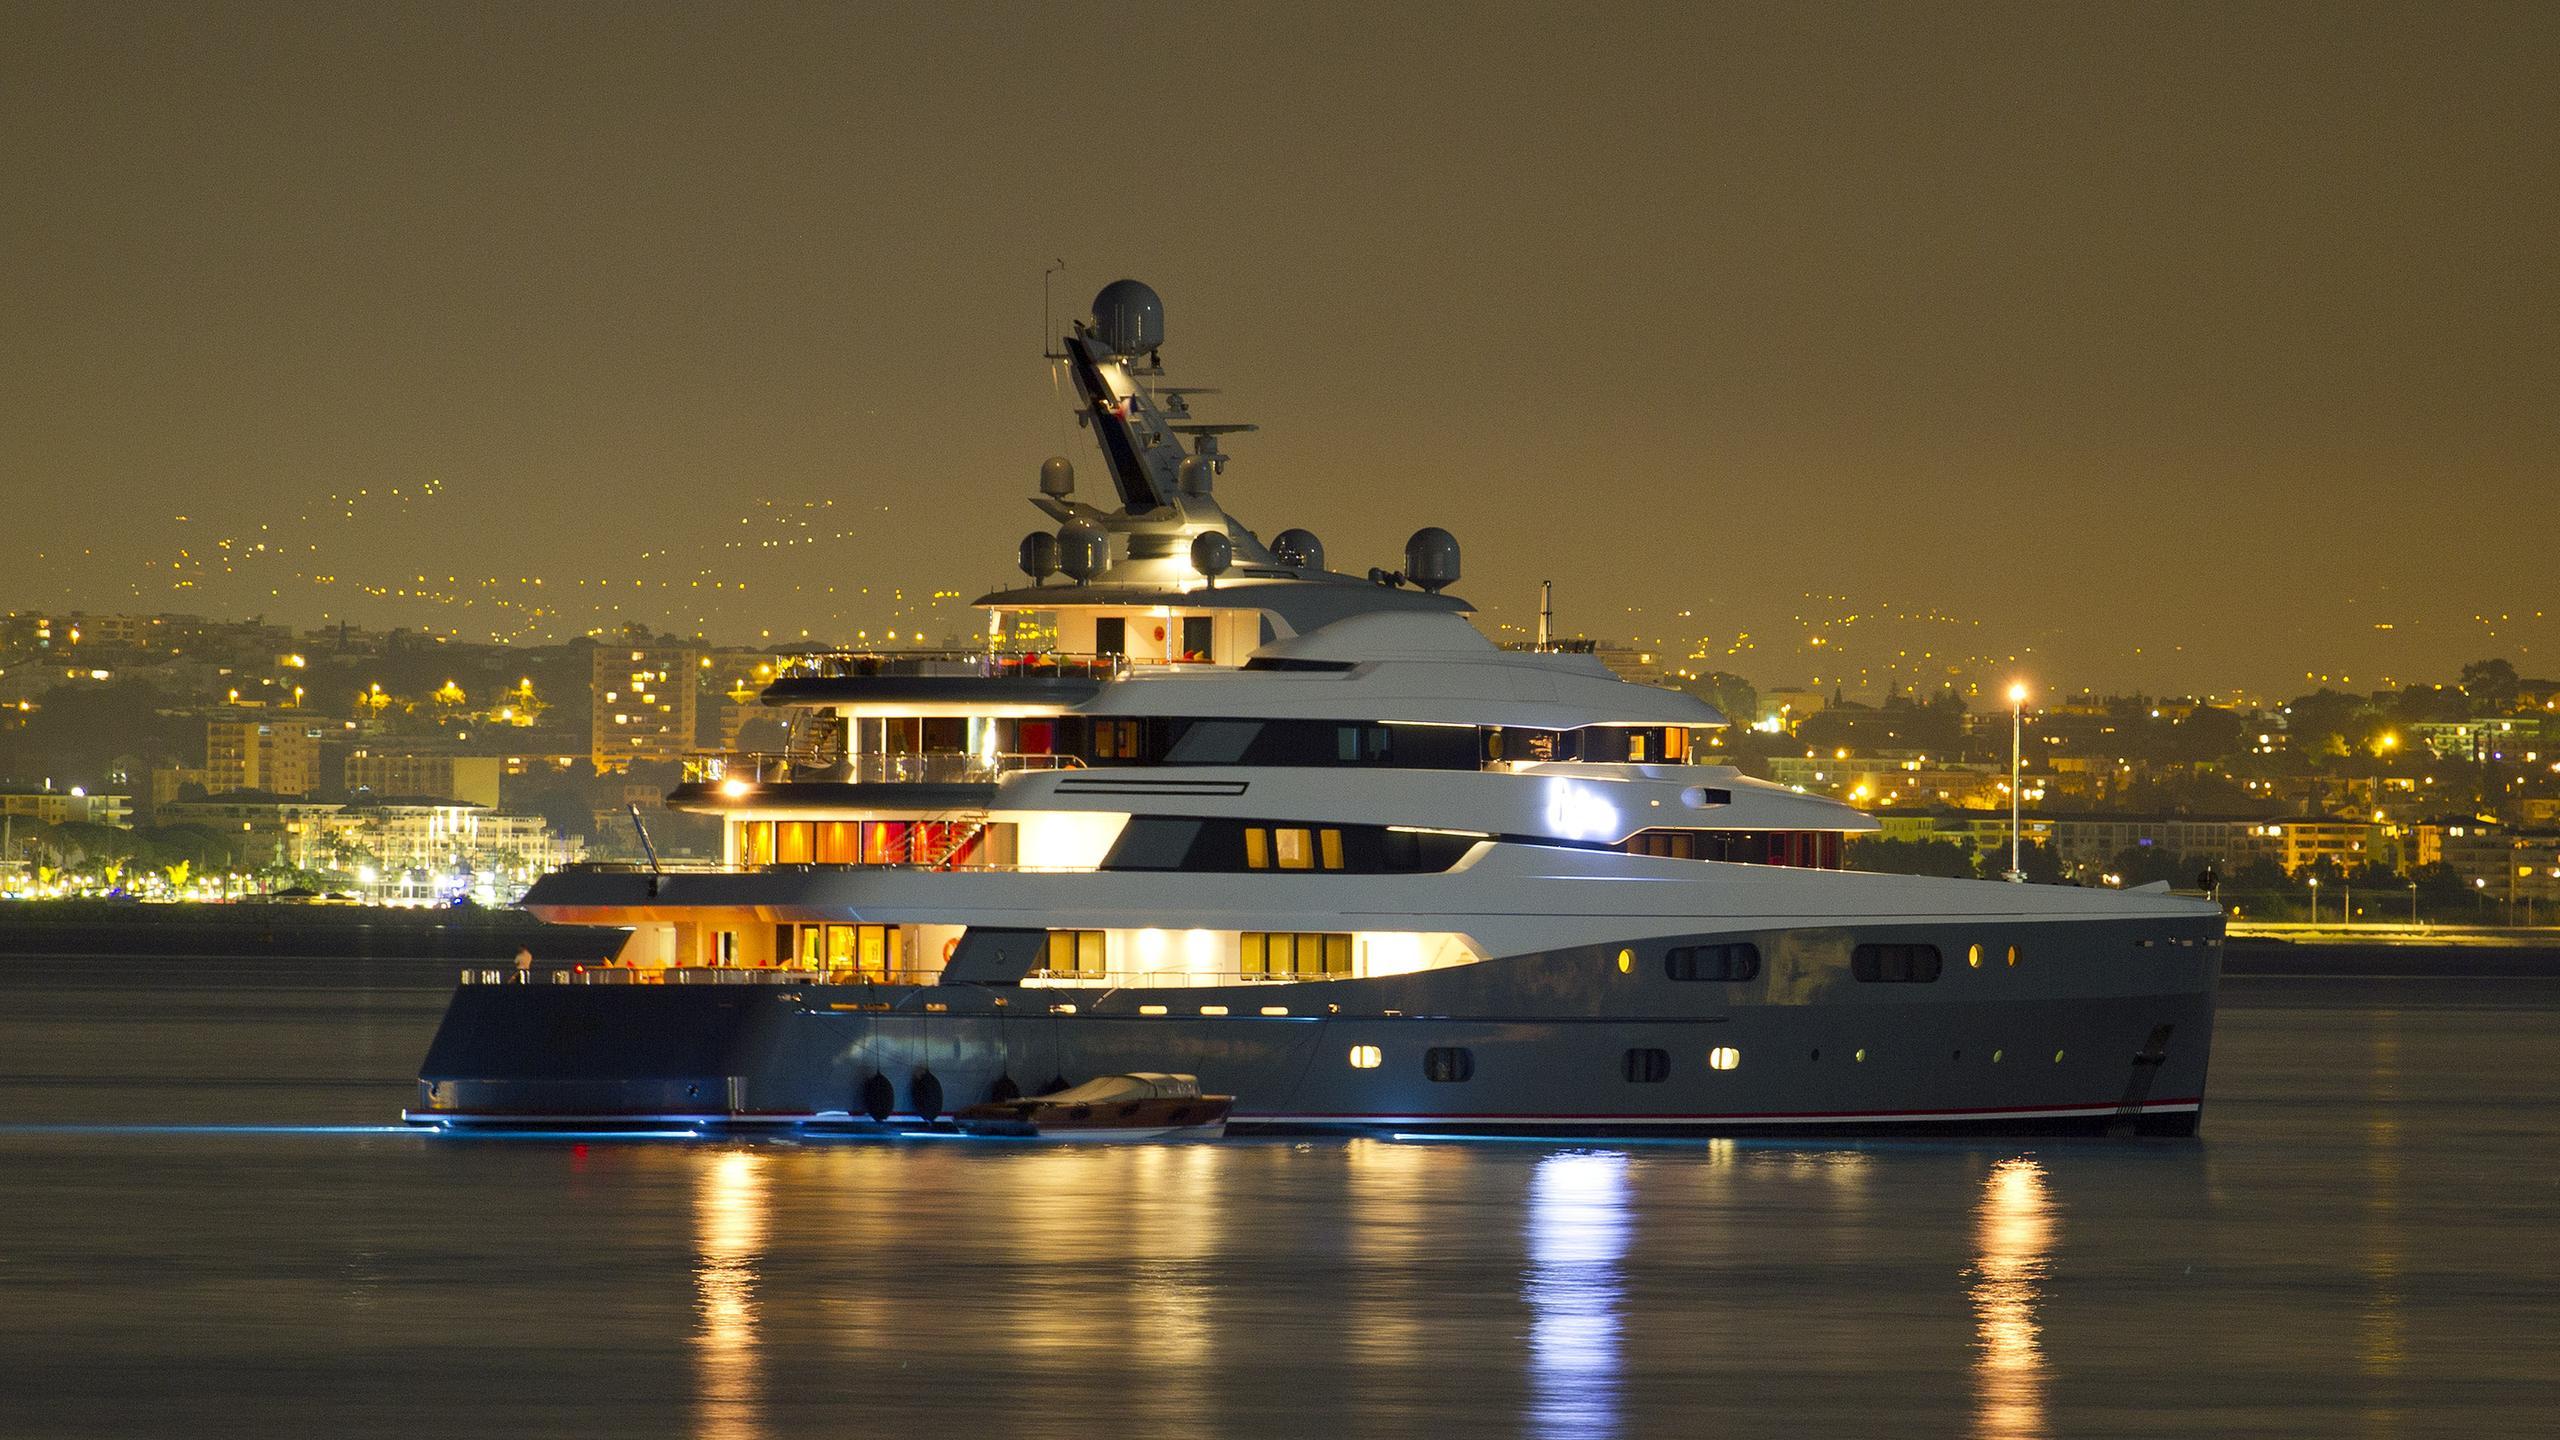 aviva-motor-yacht-abeking-rasmussen-2007-68m-half-profile-by-night